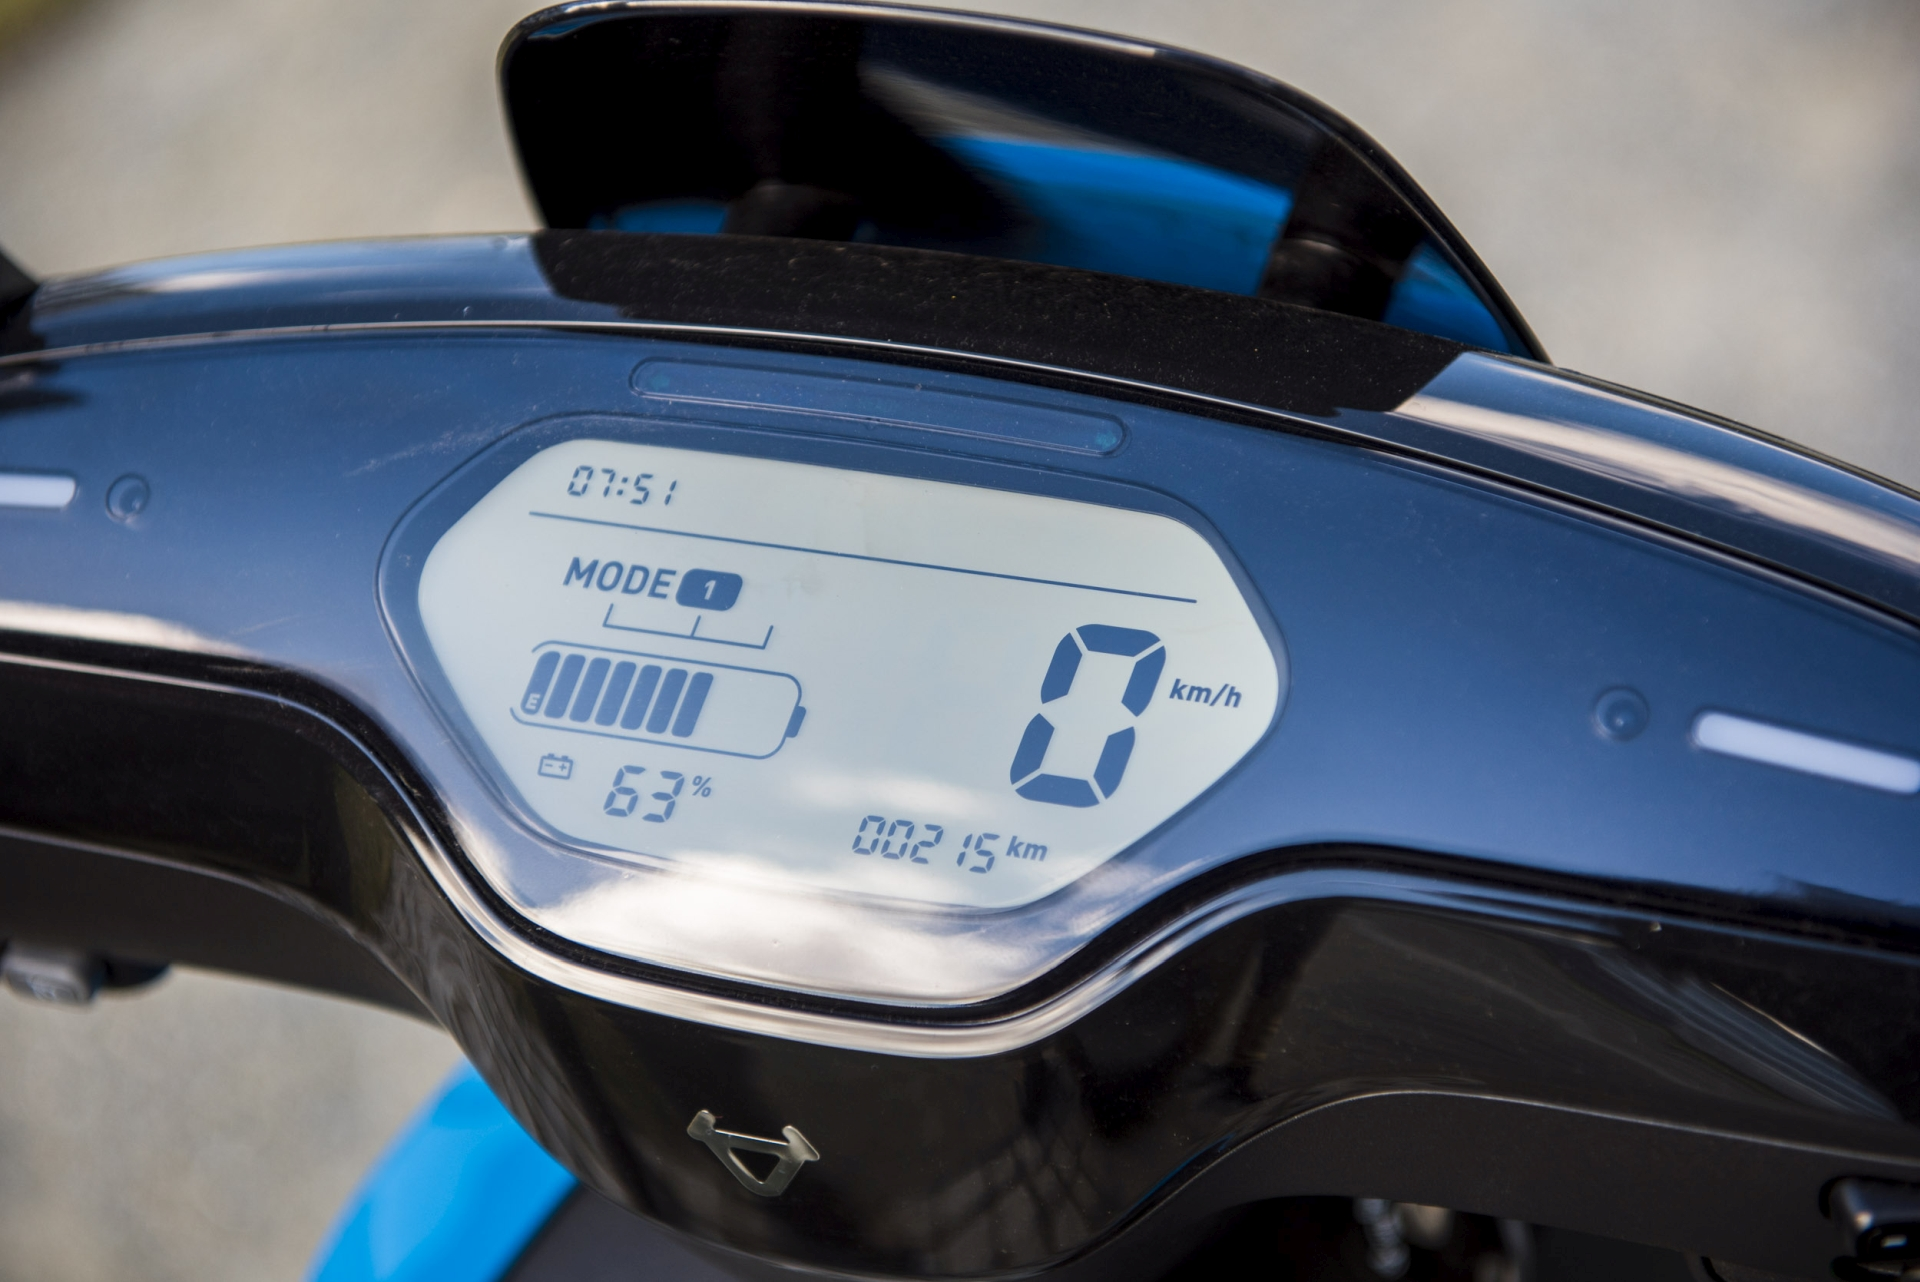 Elektryczny motorower NIU M Series